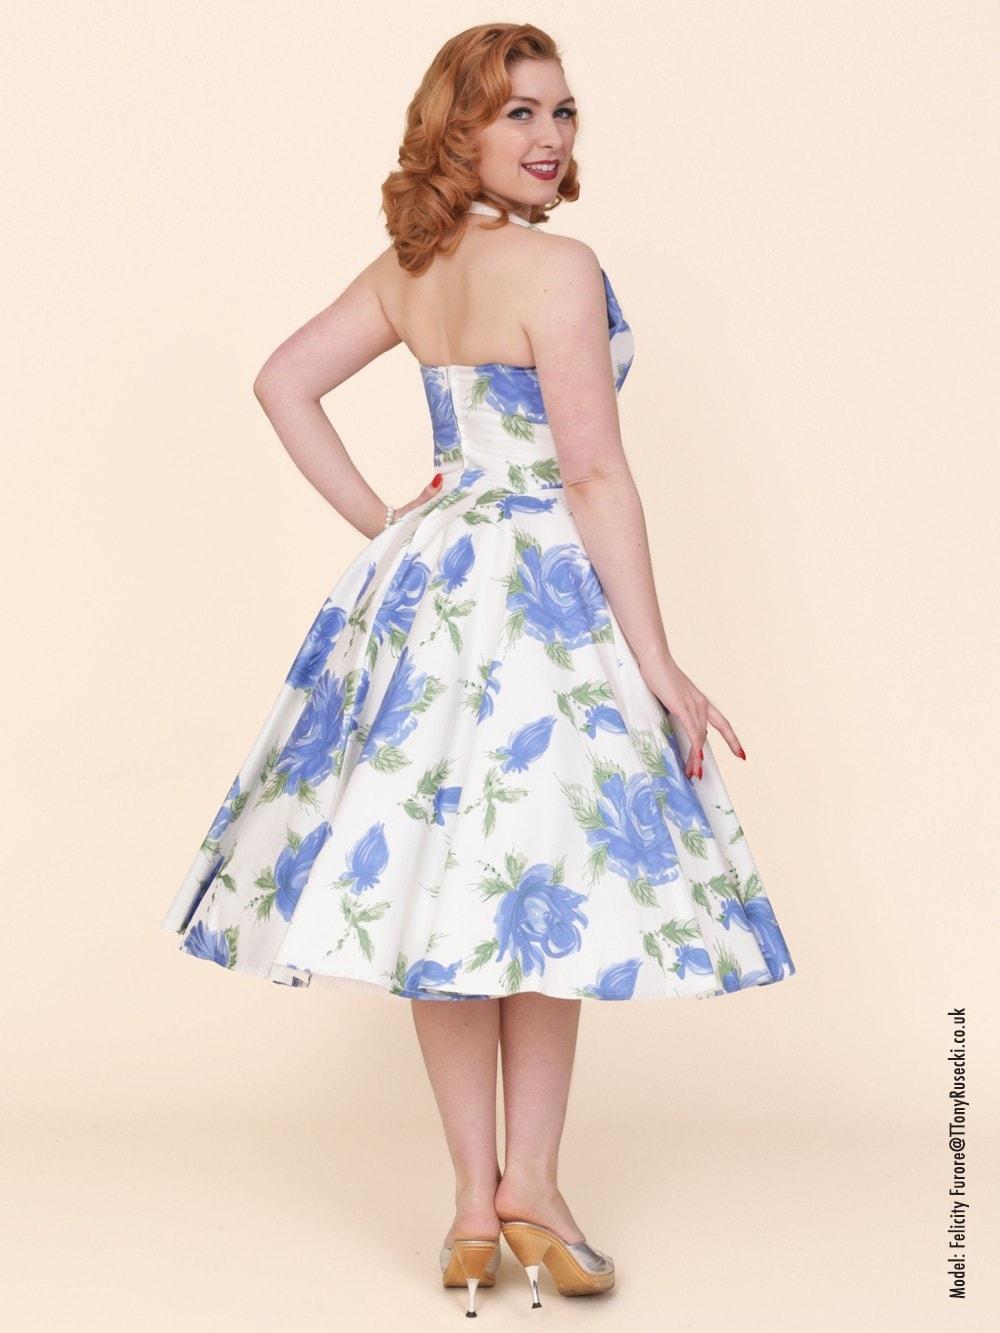 2653b82b 1950s Halterneck Victory Rose Royal Dress from Vivien of Holloway